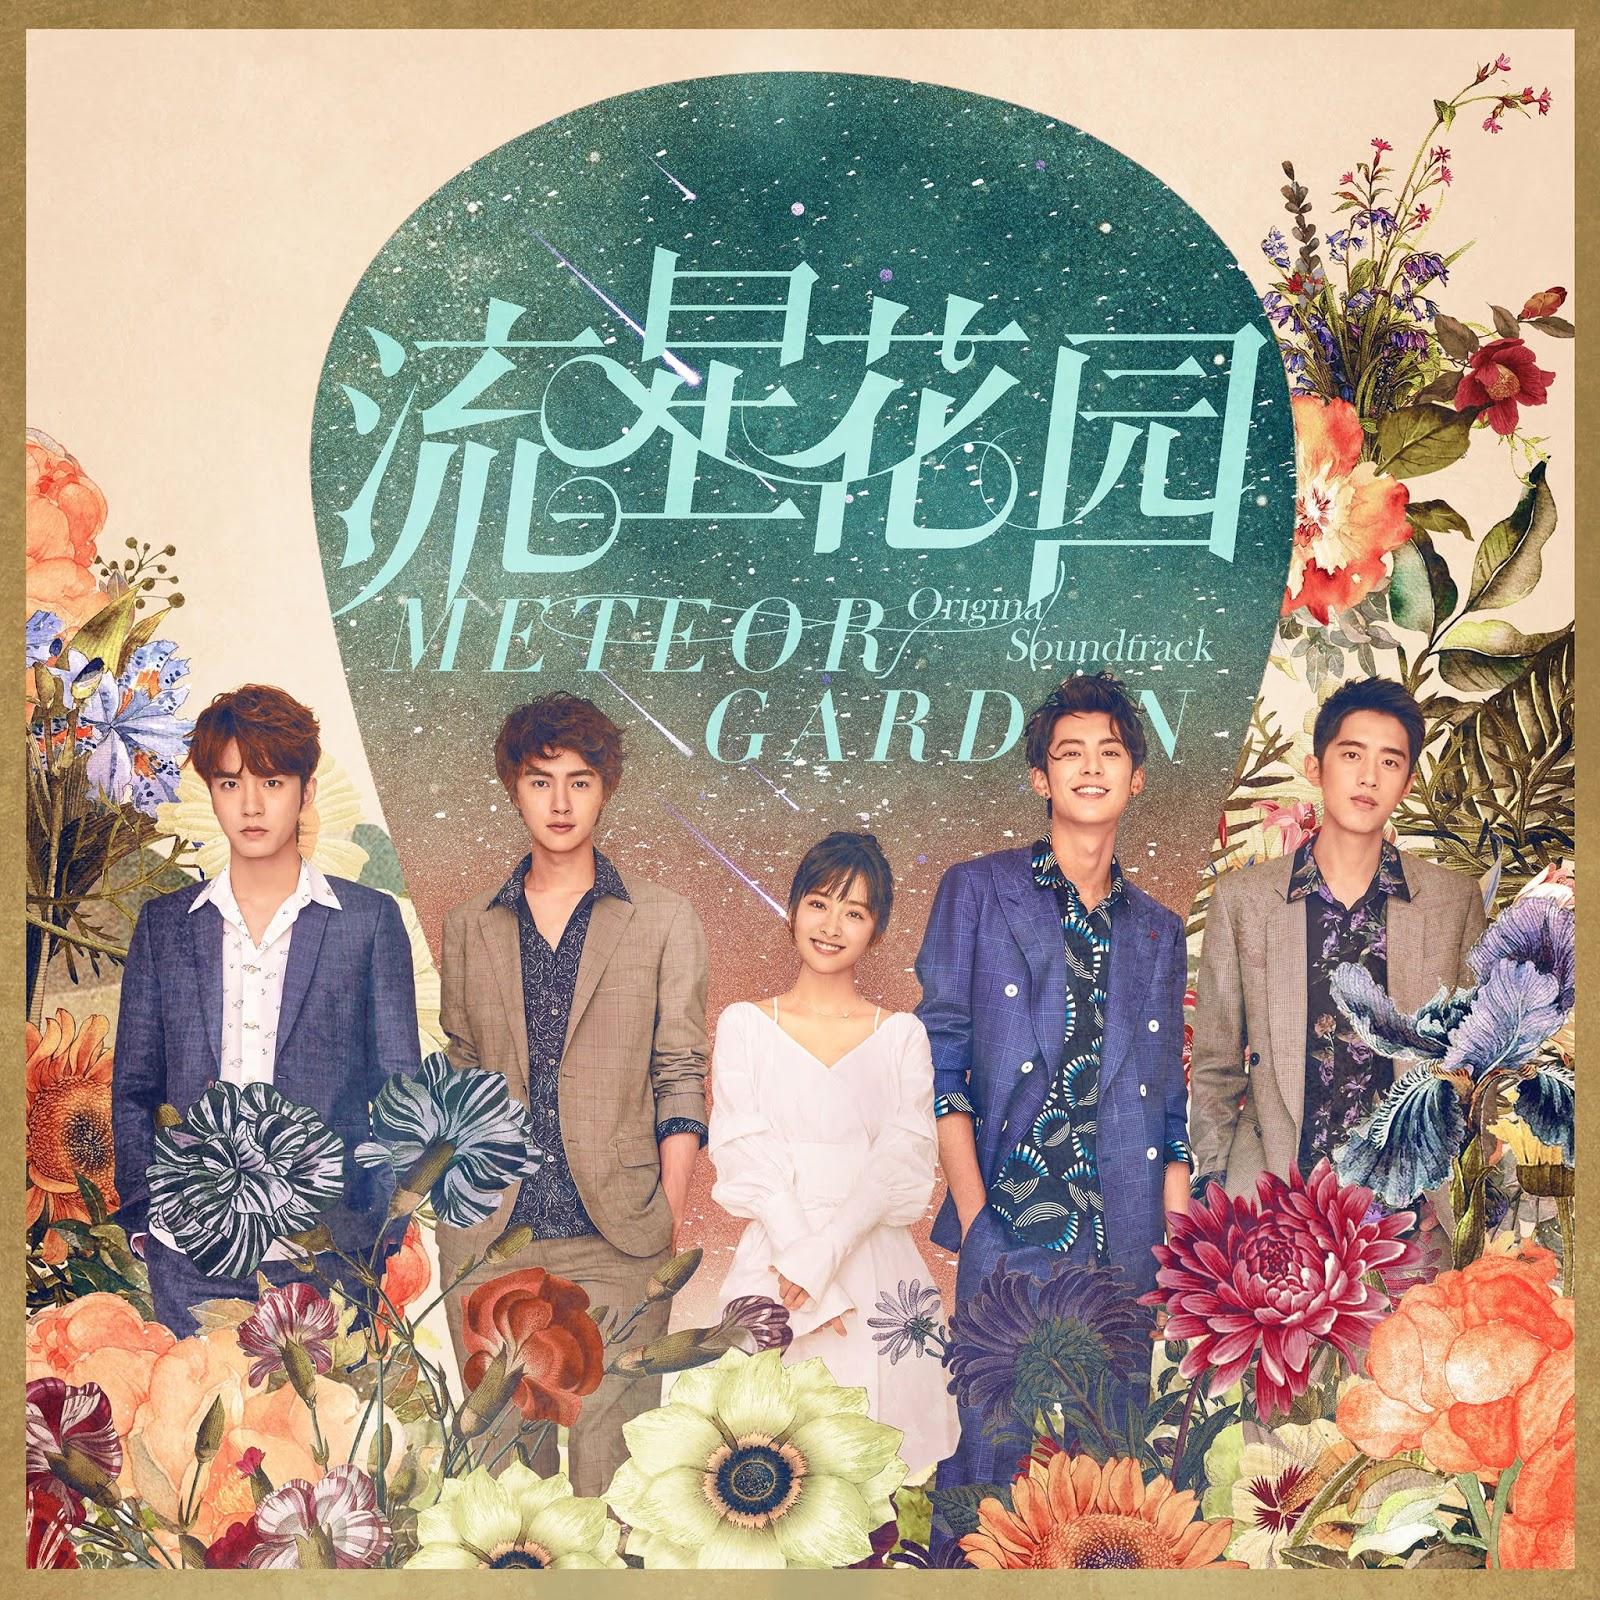 F4 For You Meteor Garden 2018 Ost Lyrics ÆŒè©žwith Pinyin Musicacrossasia